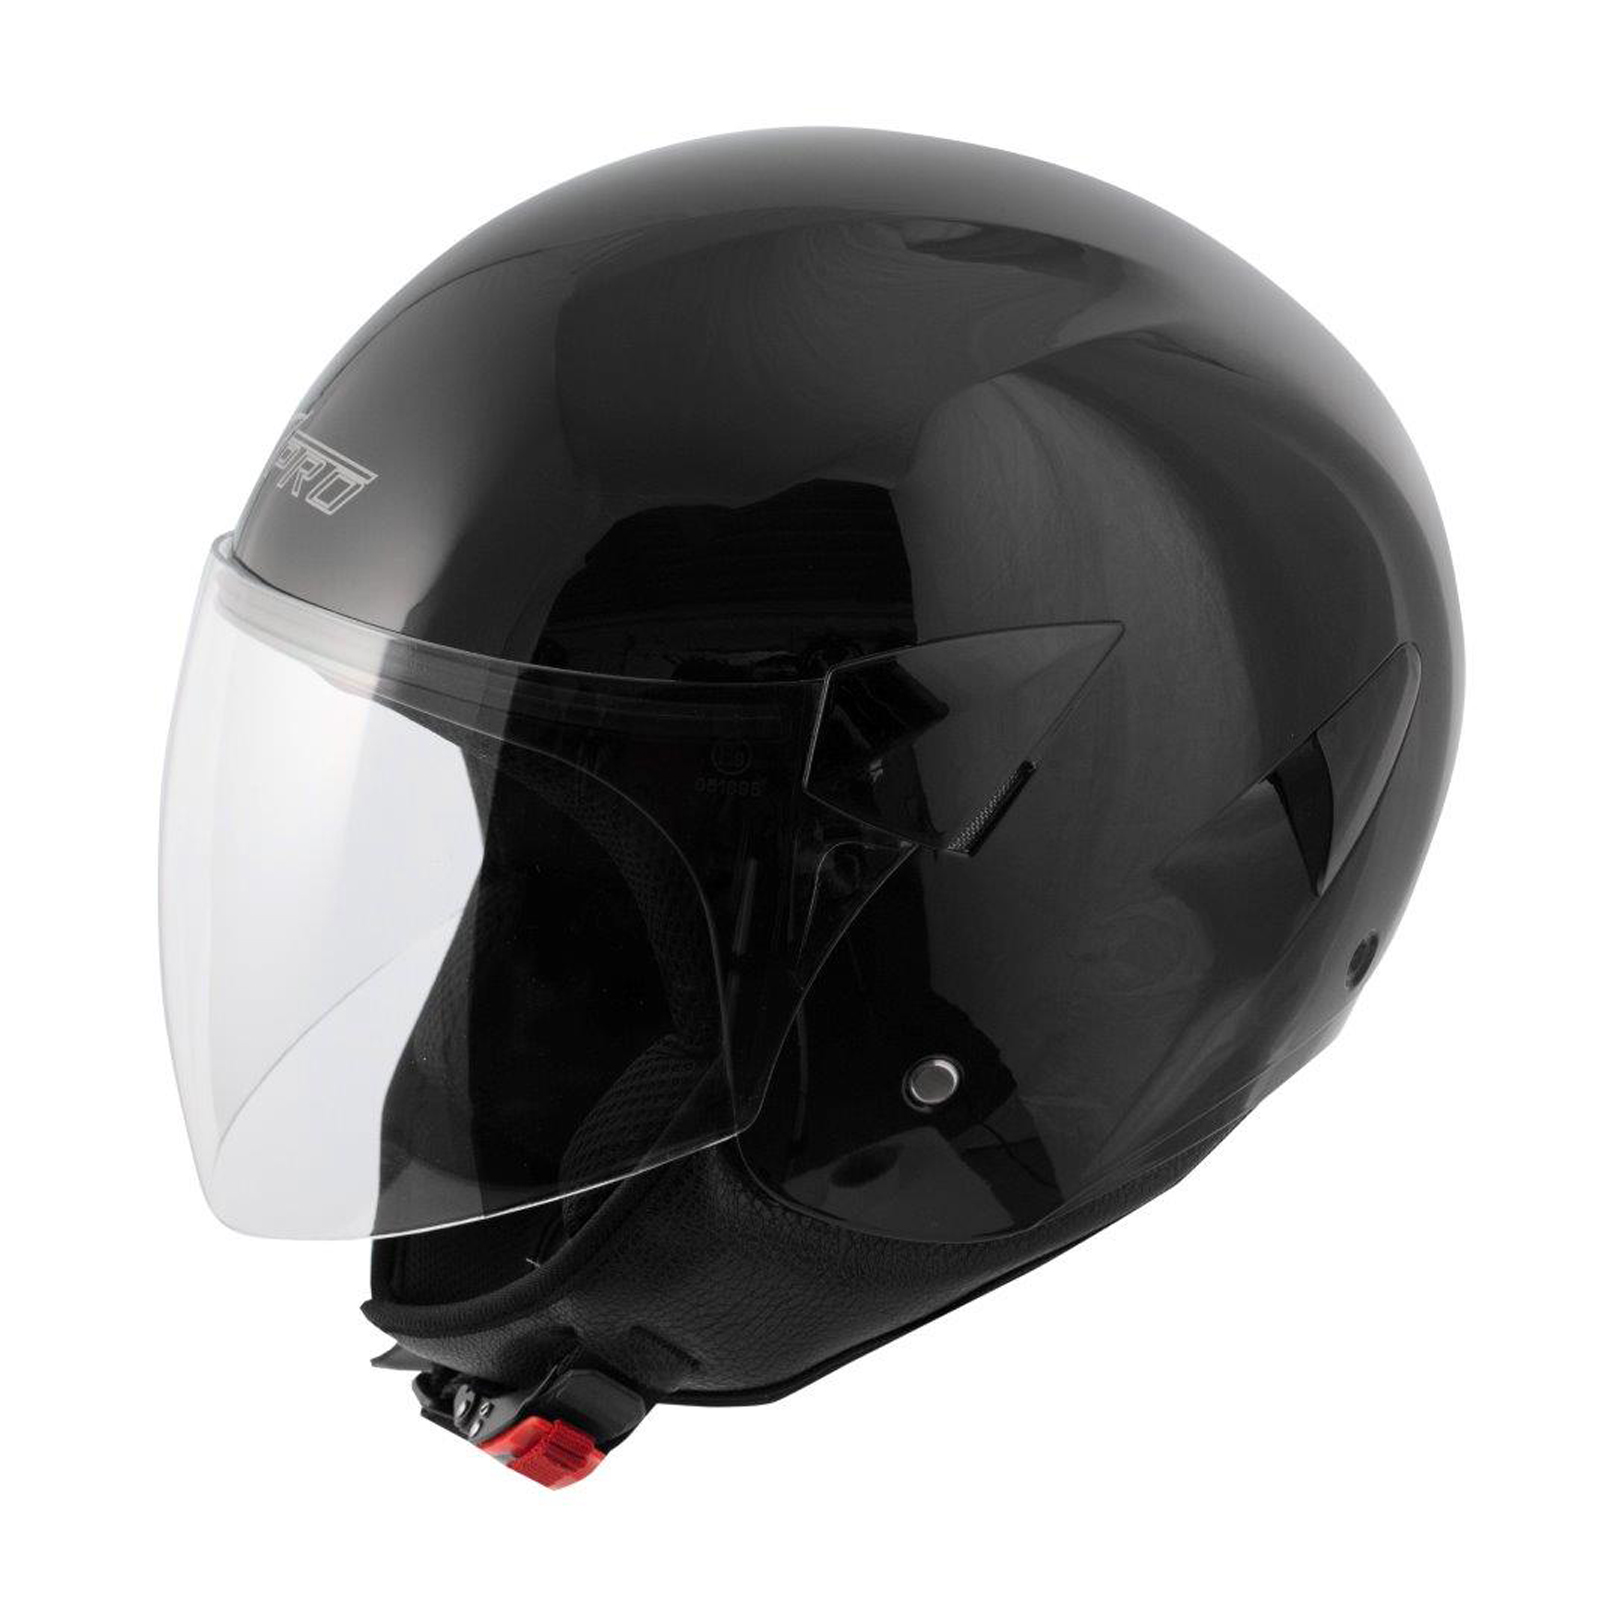 30bb52ab918c2 Demi Jet Casco Moto Scooter Homologado ECE 22-05 Visor Pantalla ...